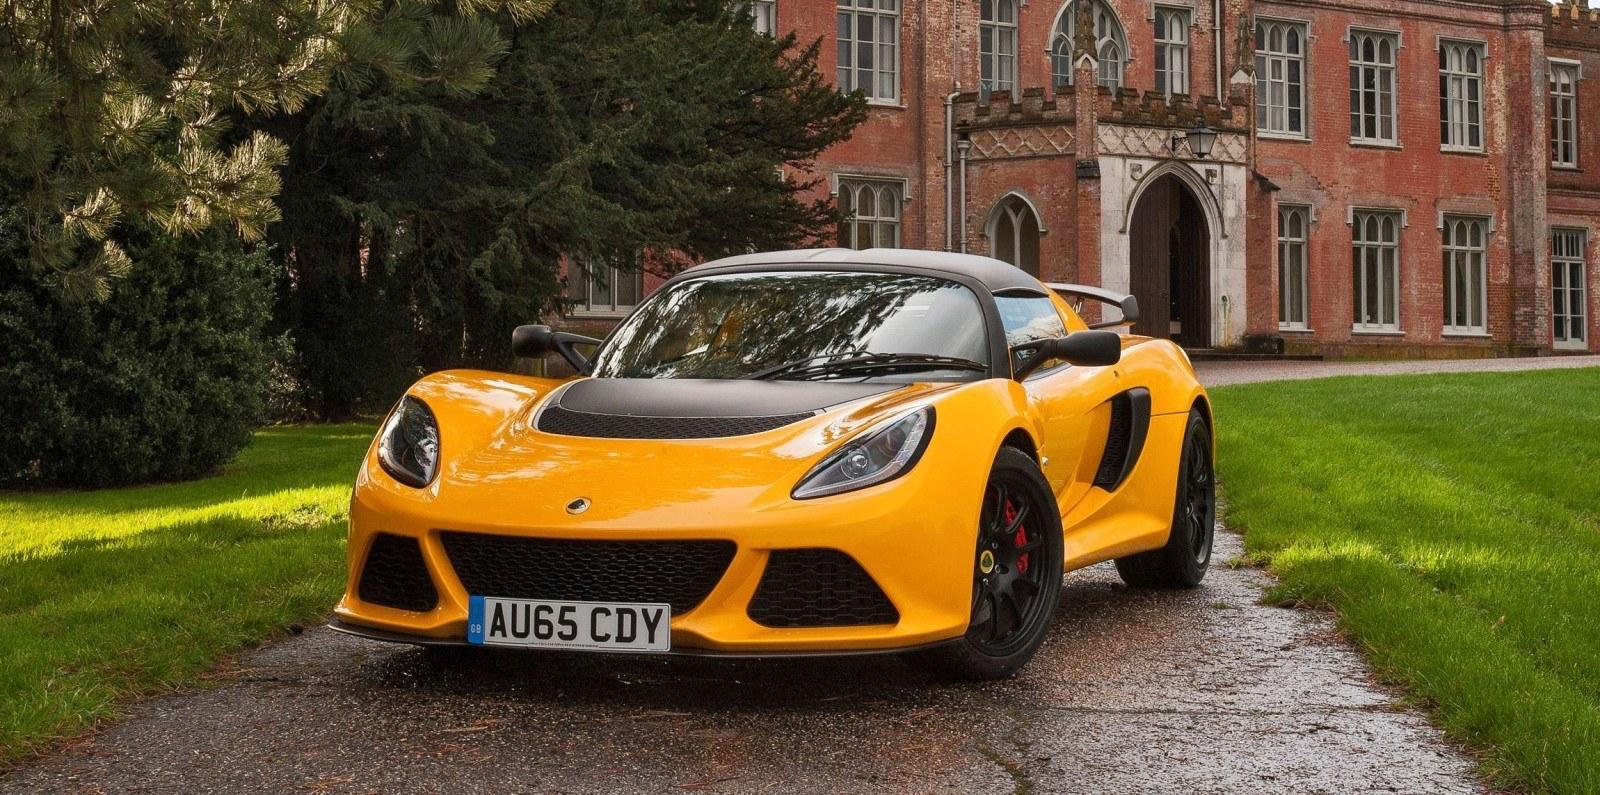 http://www.car-revs-daily.com/wp-content/uploads/2015/12/2016-Lotus-EXIGE-SPORT-350-21-1600x795.jpg